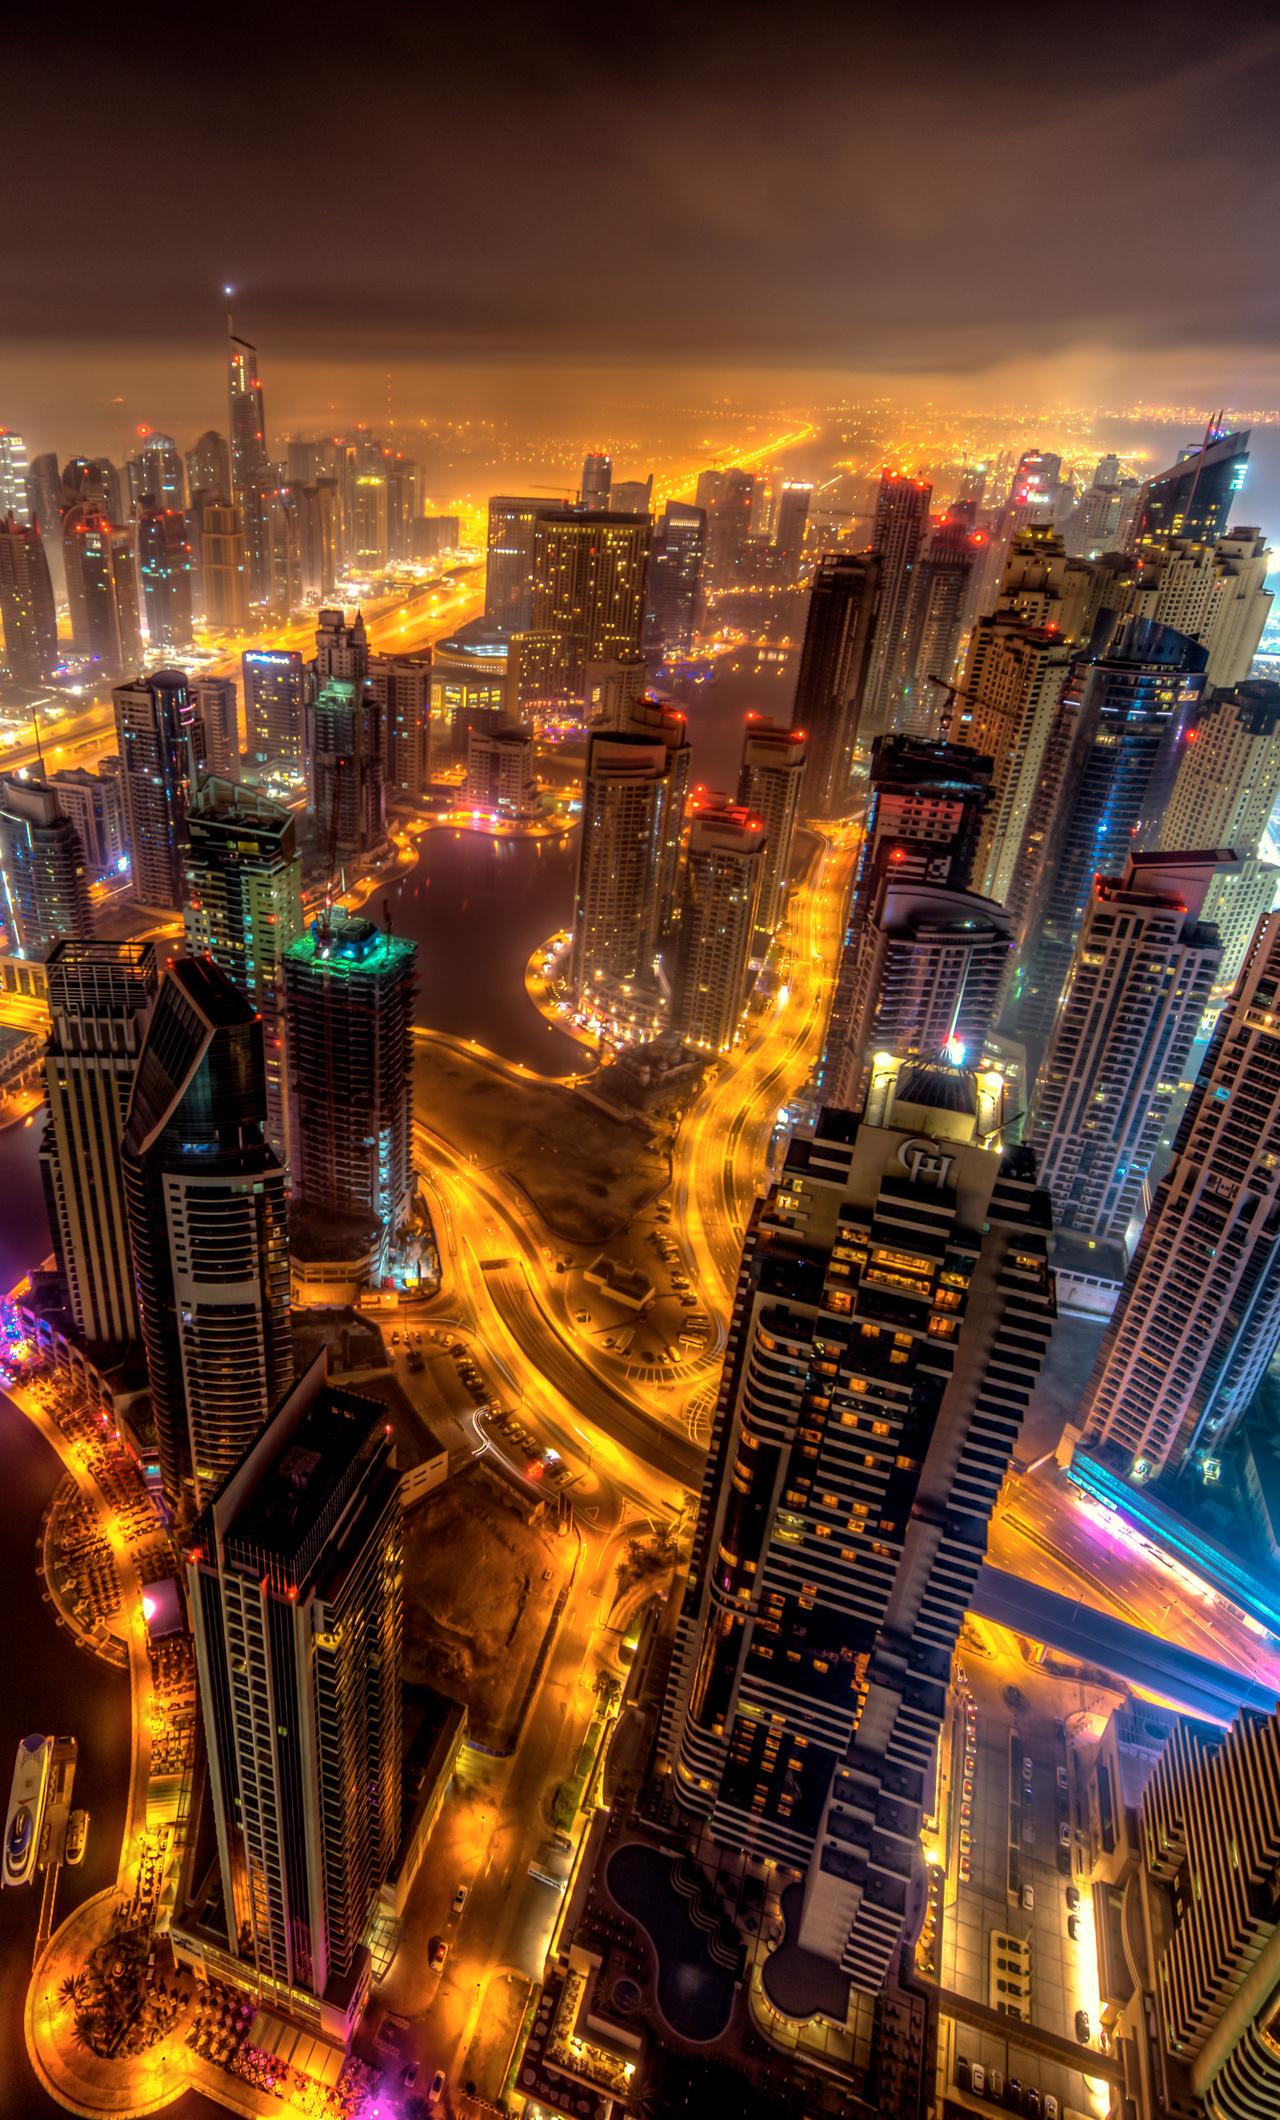 Popular Wallpaper Night Dubai - dubai-buildings-night-lights-top-view-8k-sb-1280x2120  Best Photo Reference-649033.jpg